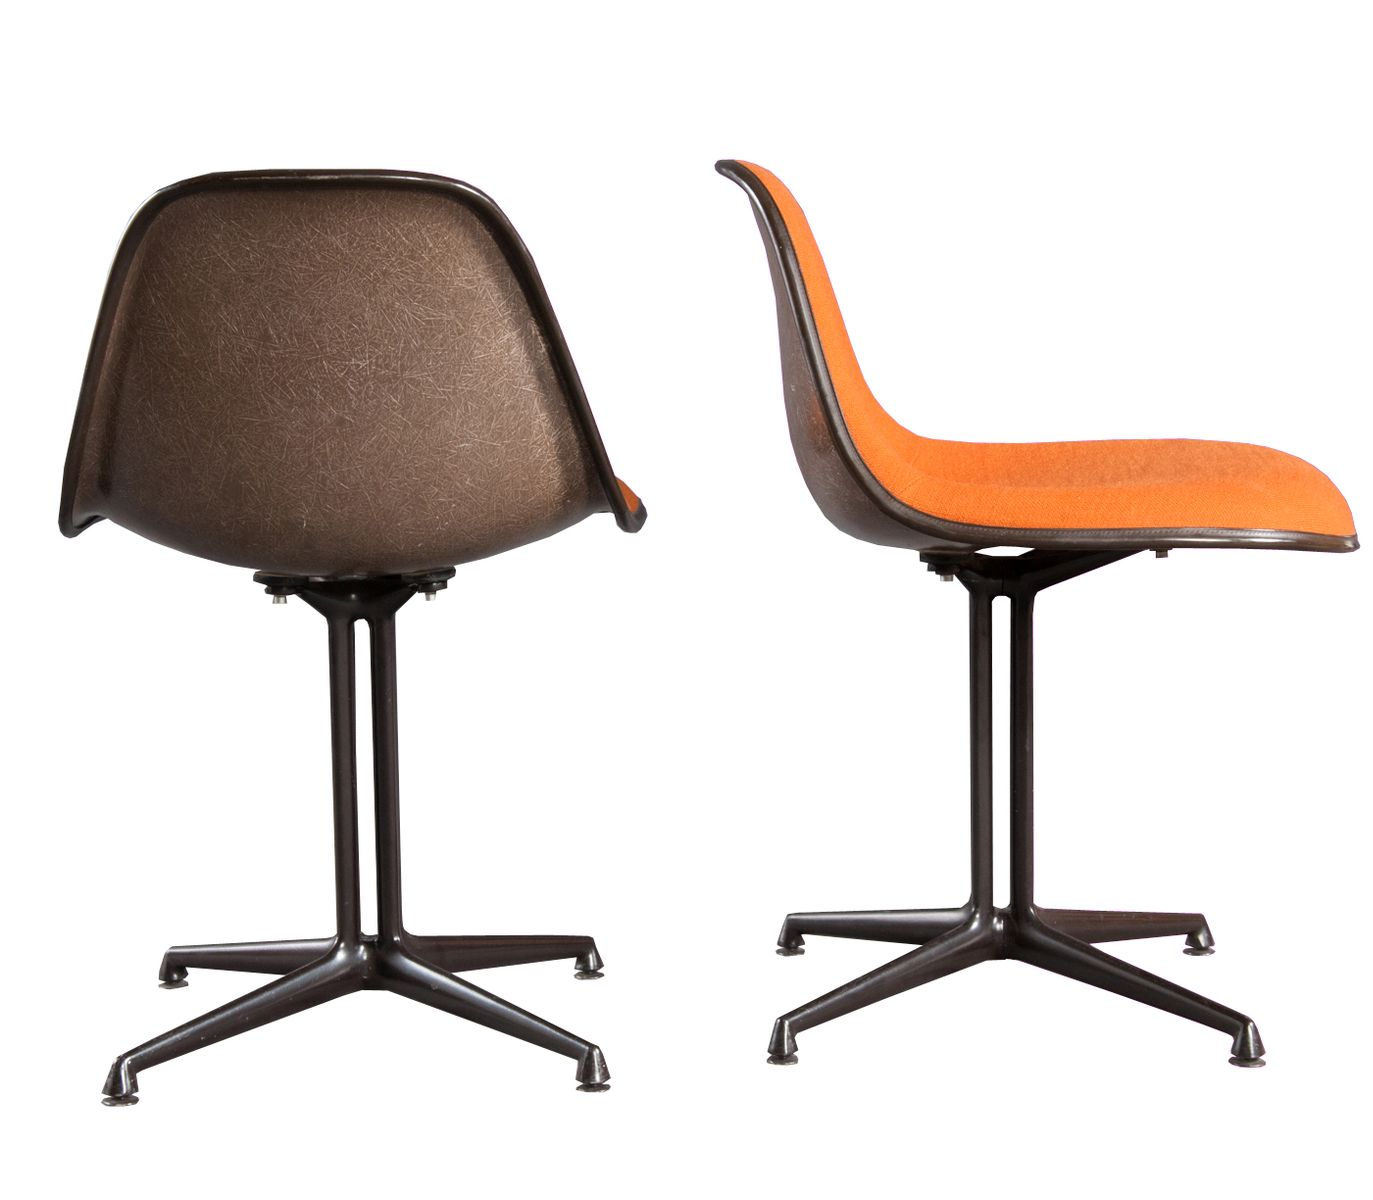 amerikanischer la fonda stuhl von charles ray eames f r. Black Bedroom Furniture Sets. Home Design Ideas